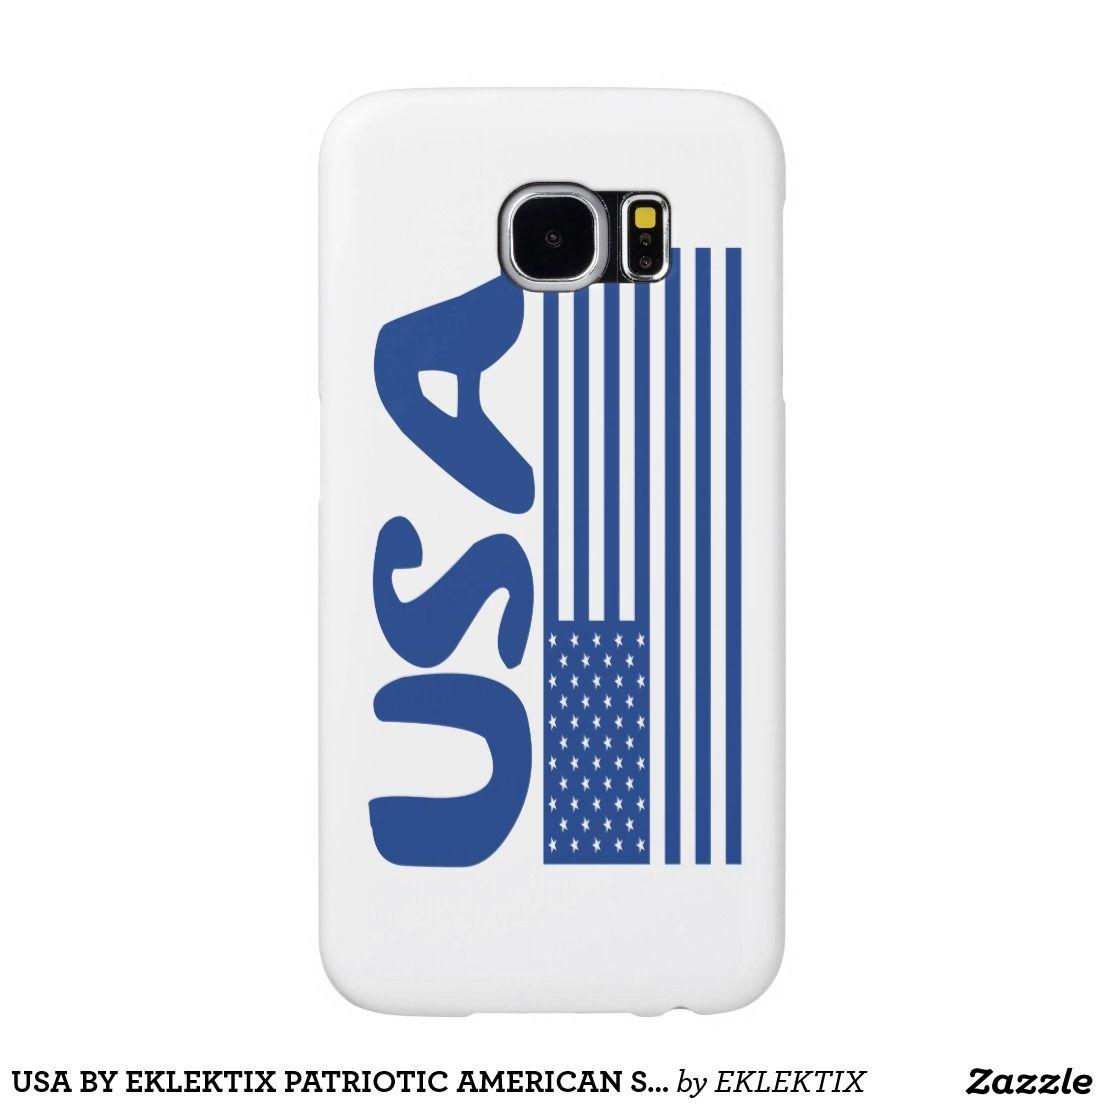 USA BY EKLEKTIX PATRIOTIC AMERICAN STUFF SAMSUNG GALAXY S6 CASES